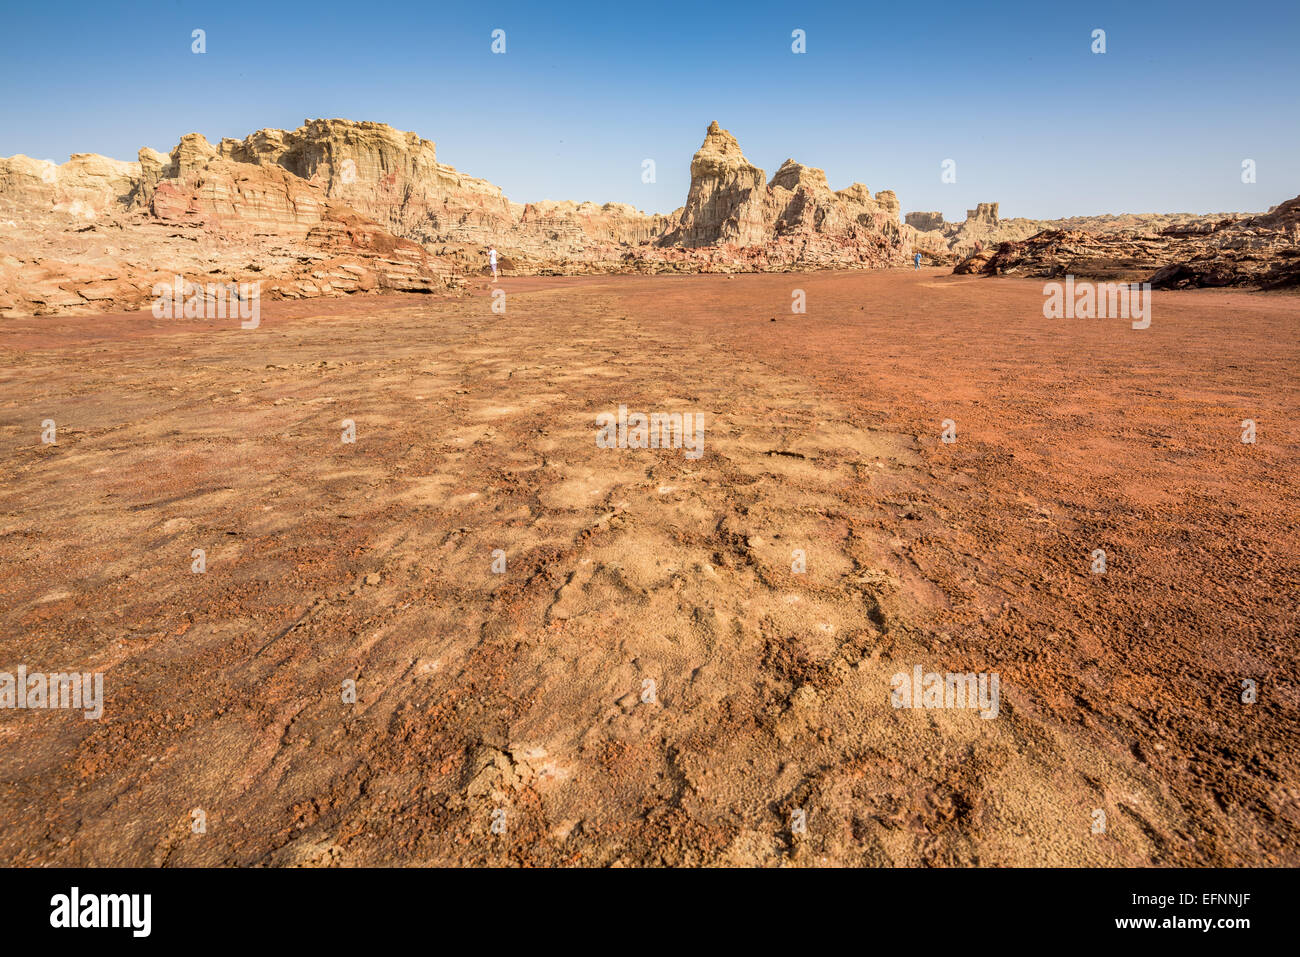 Danakil Depression desert near Dallol in Ethiopia - Stock Image